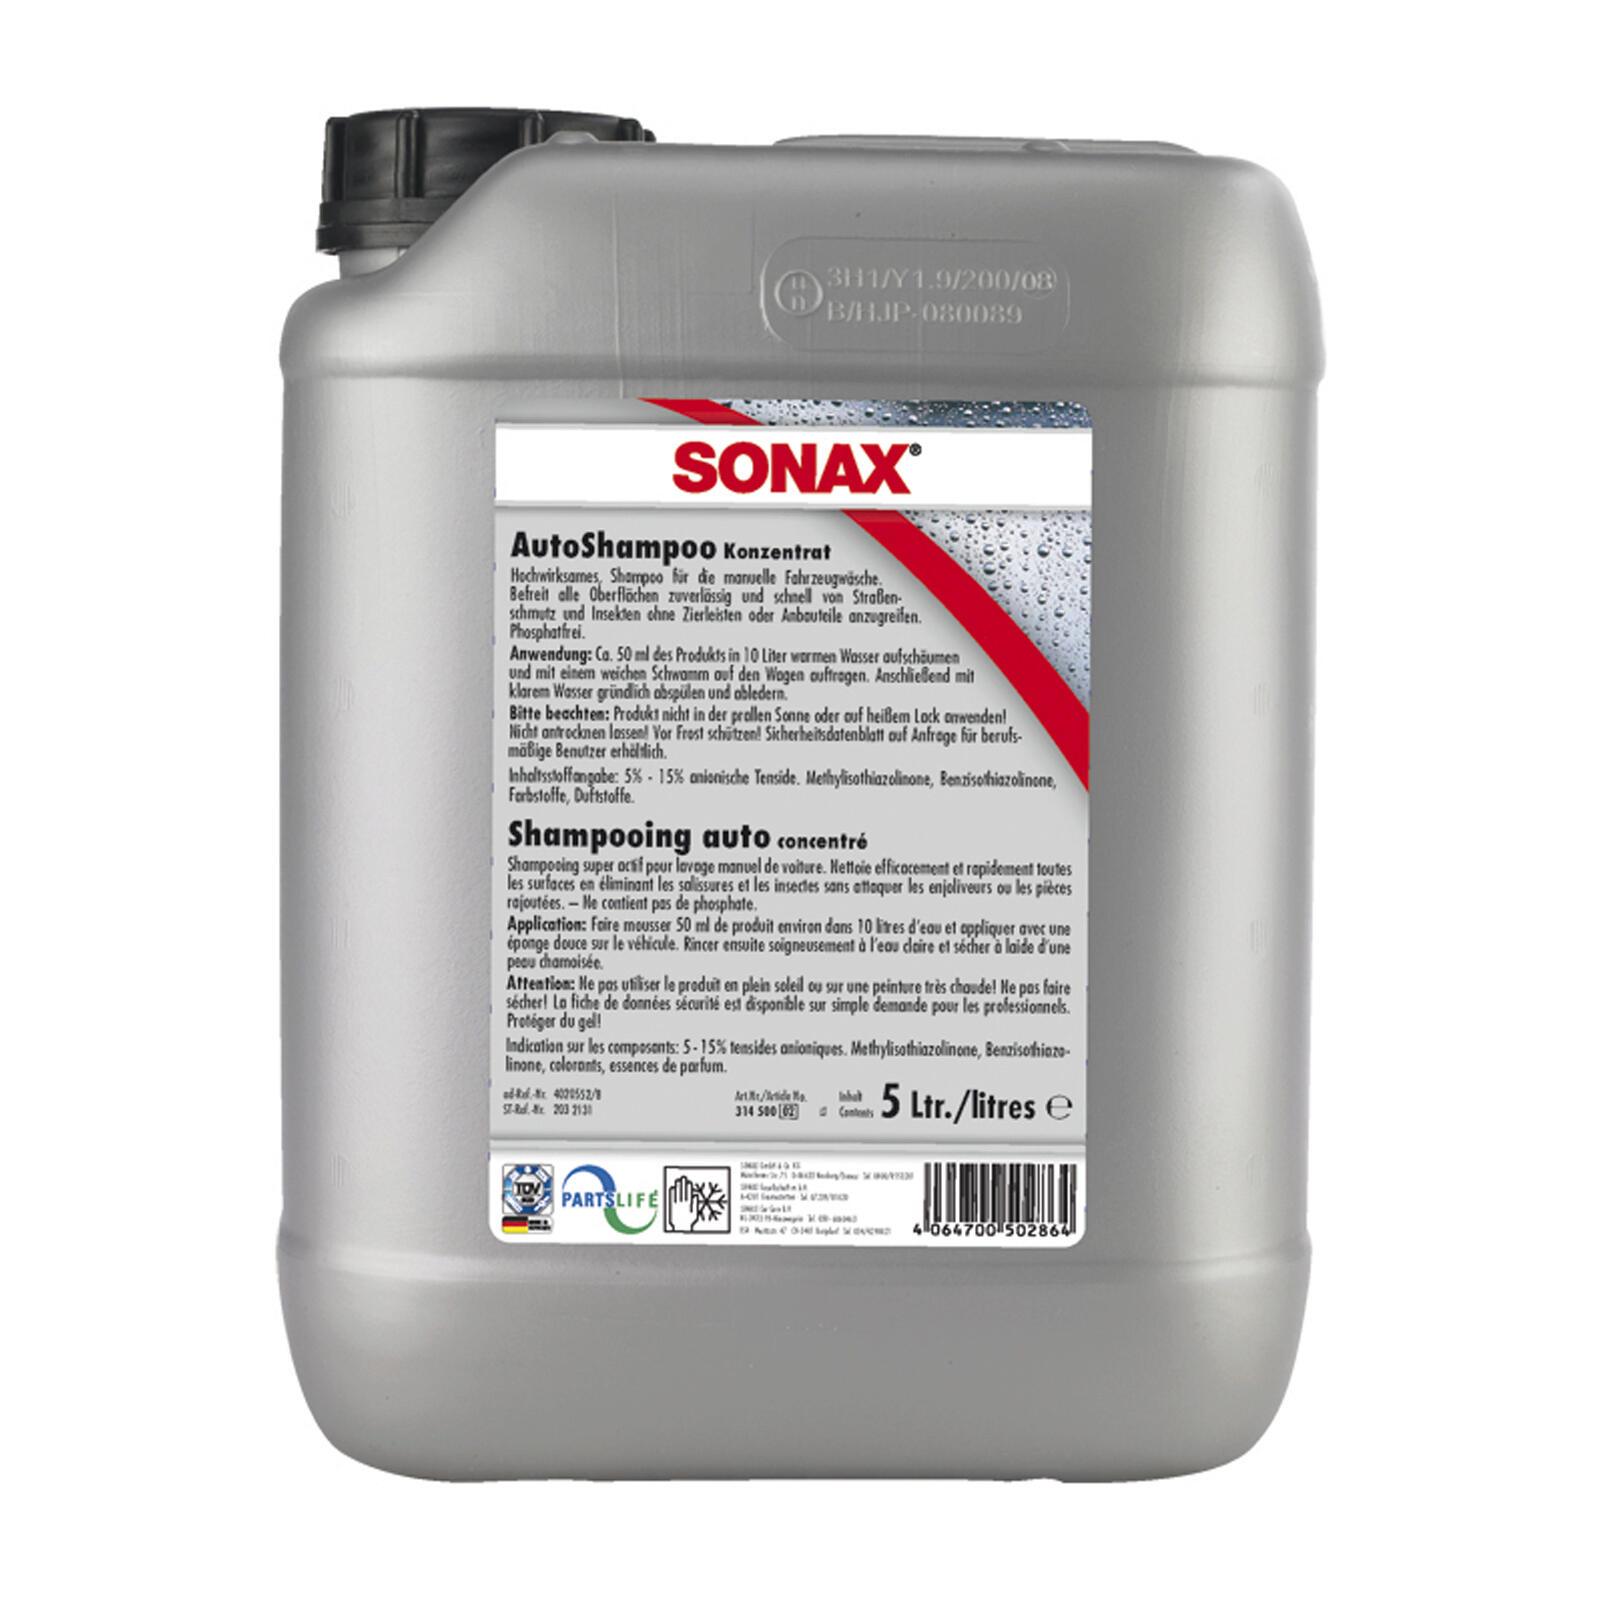 SONAX AutoShampoo Konzentrat 5l